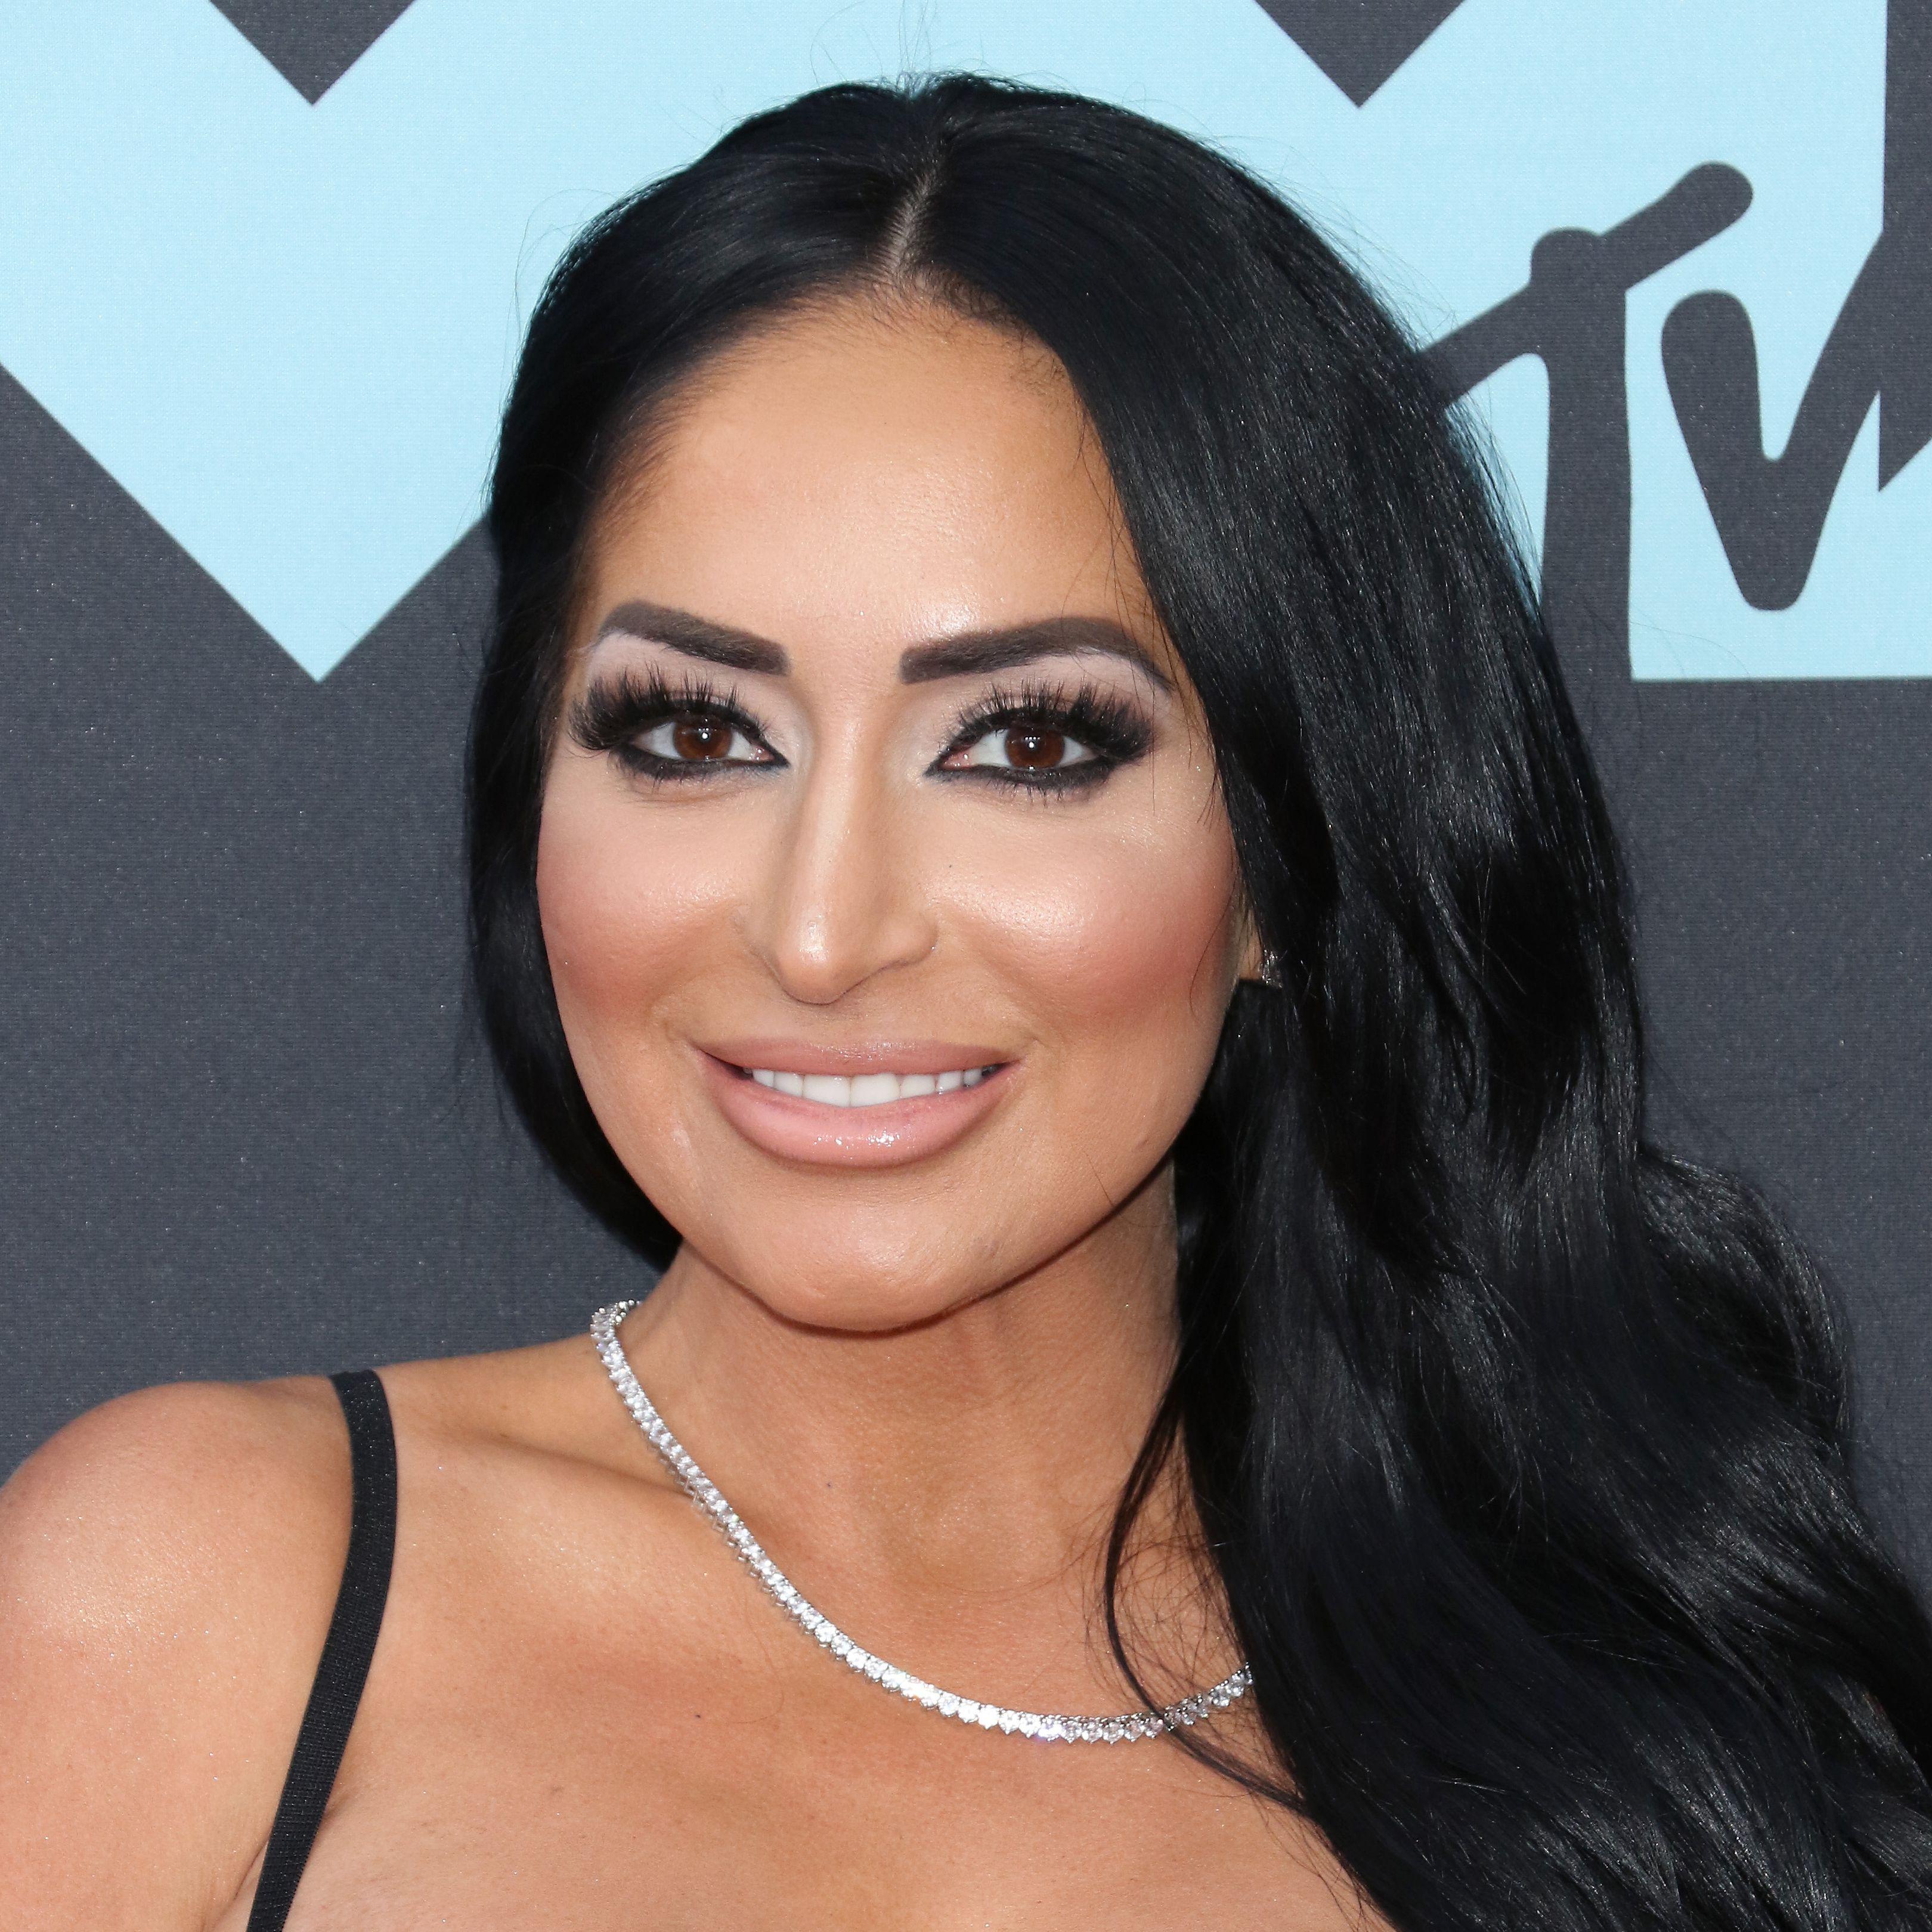 Jersey Shore's Angelina Pivarnick Is Married To Chris Larangeira